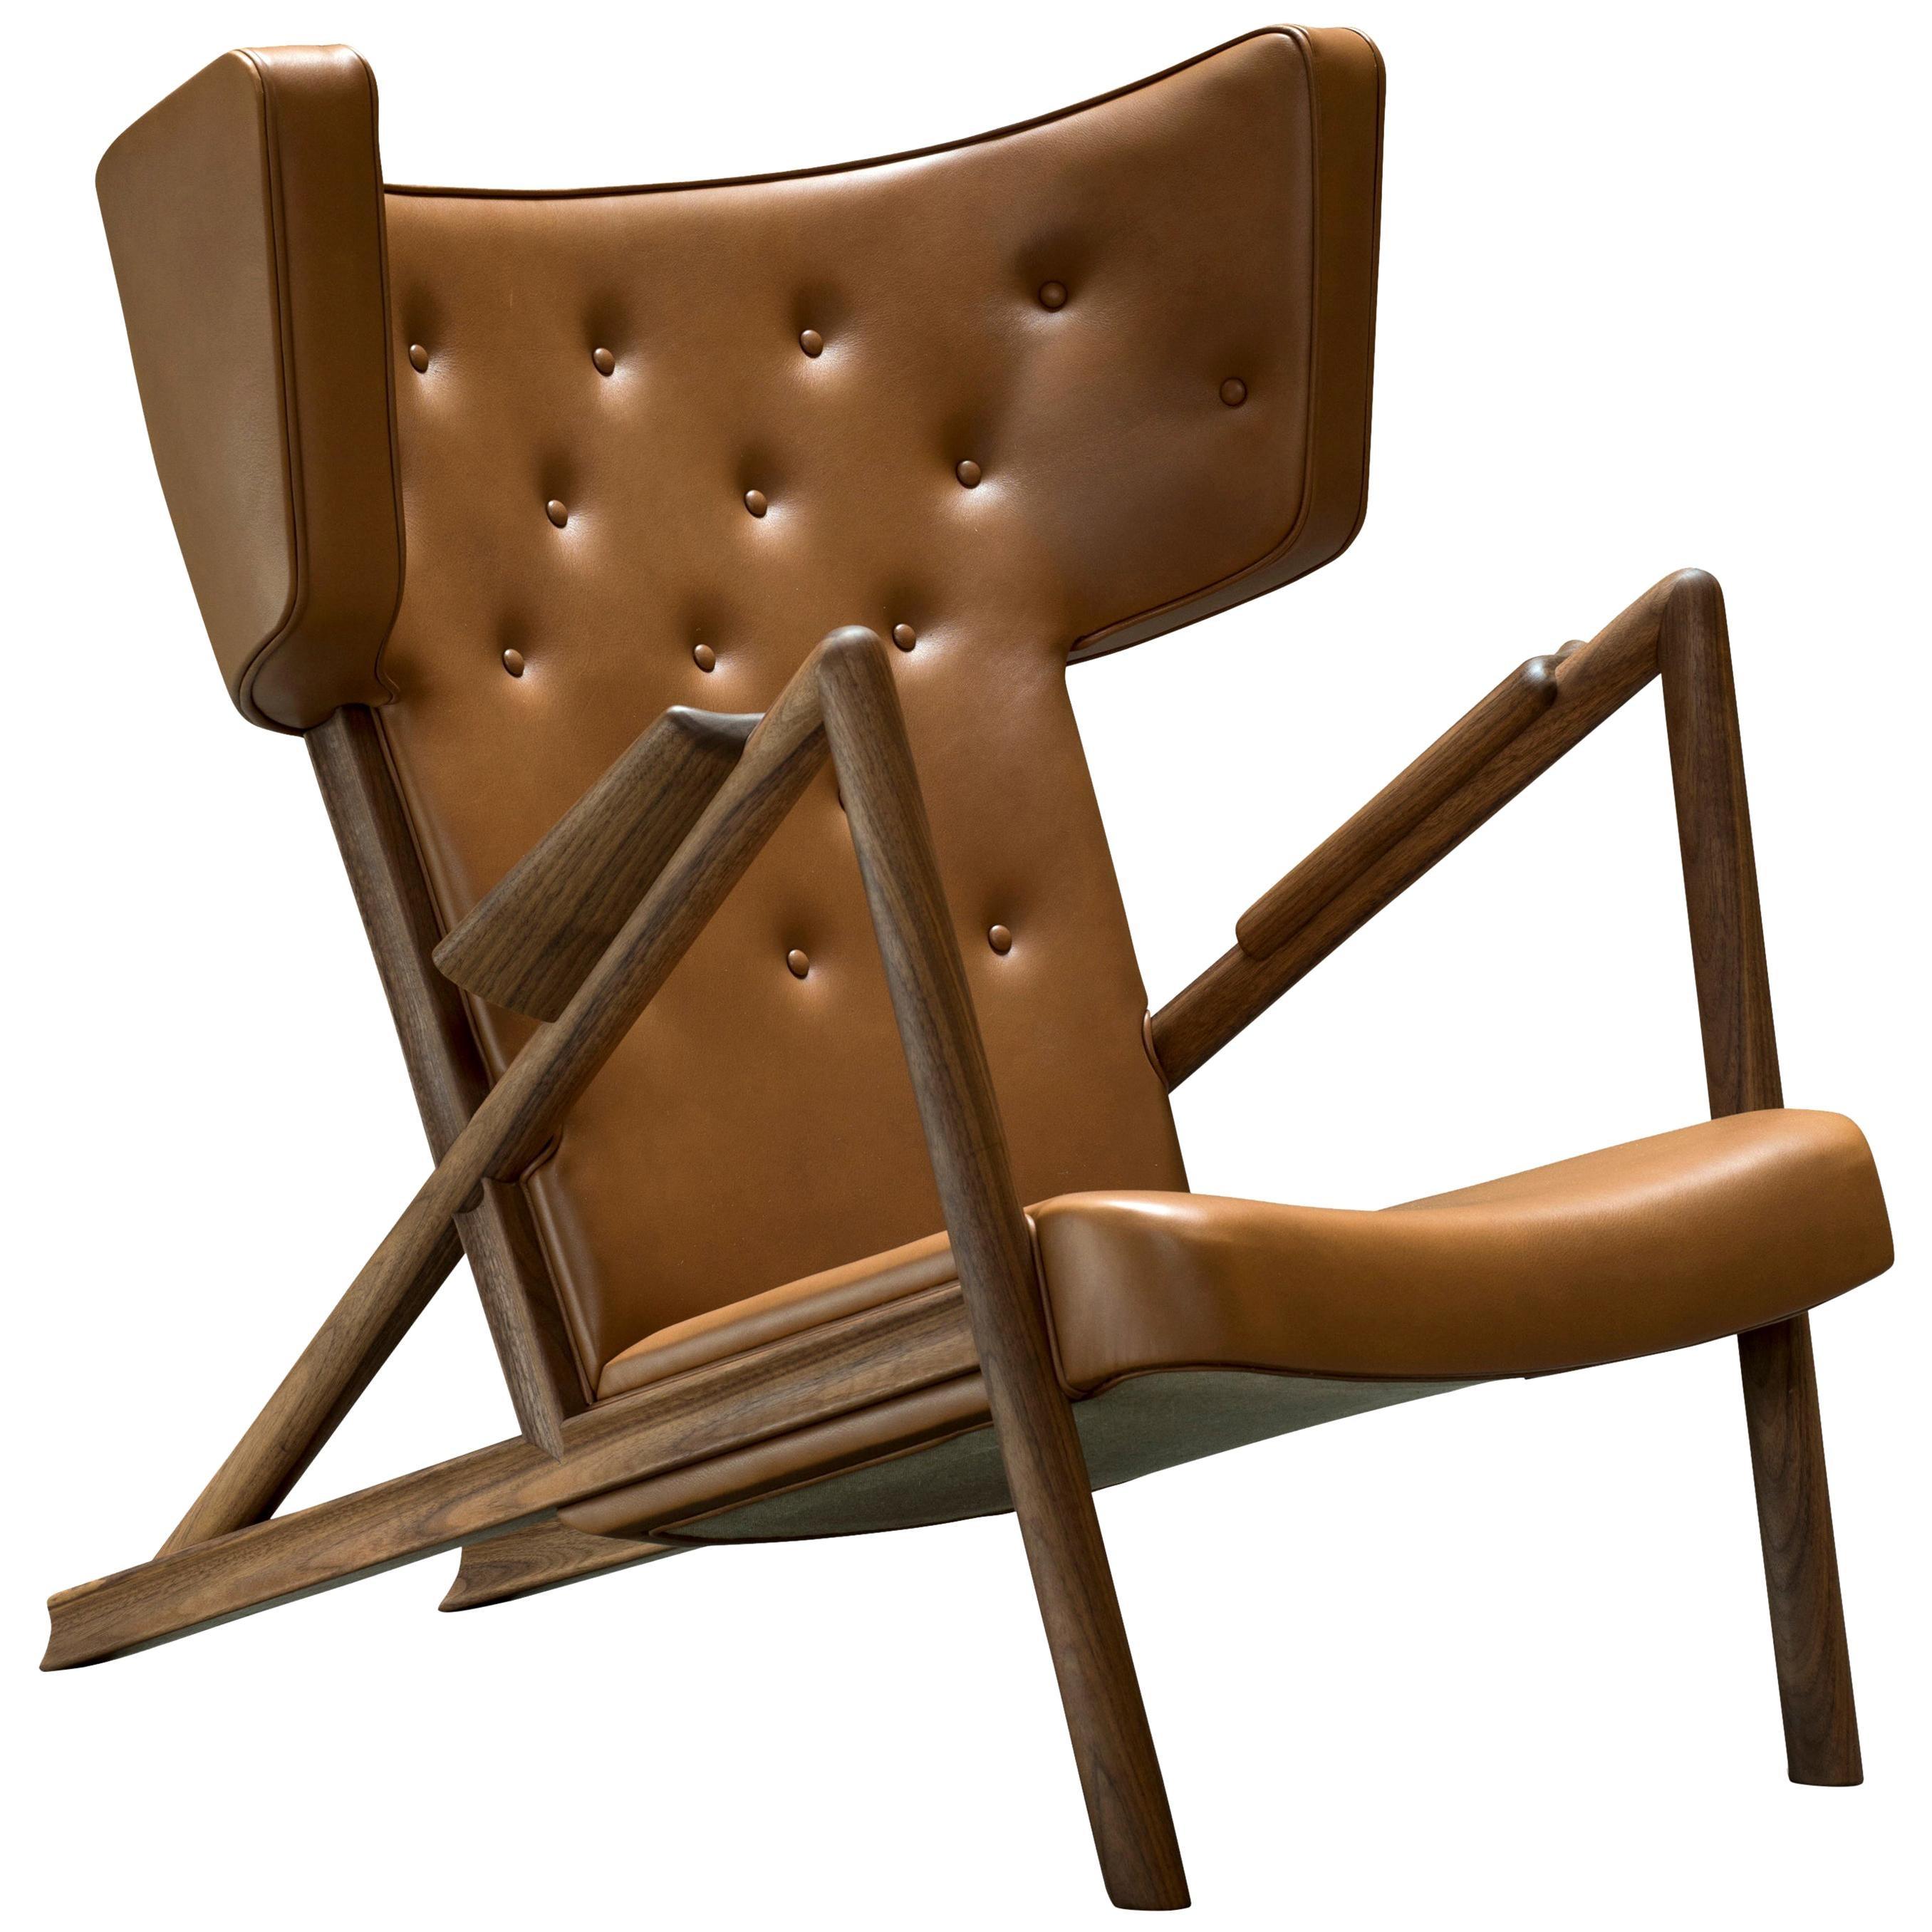 Finn Juhl Grasshopper Armchair in Wood and Leather